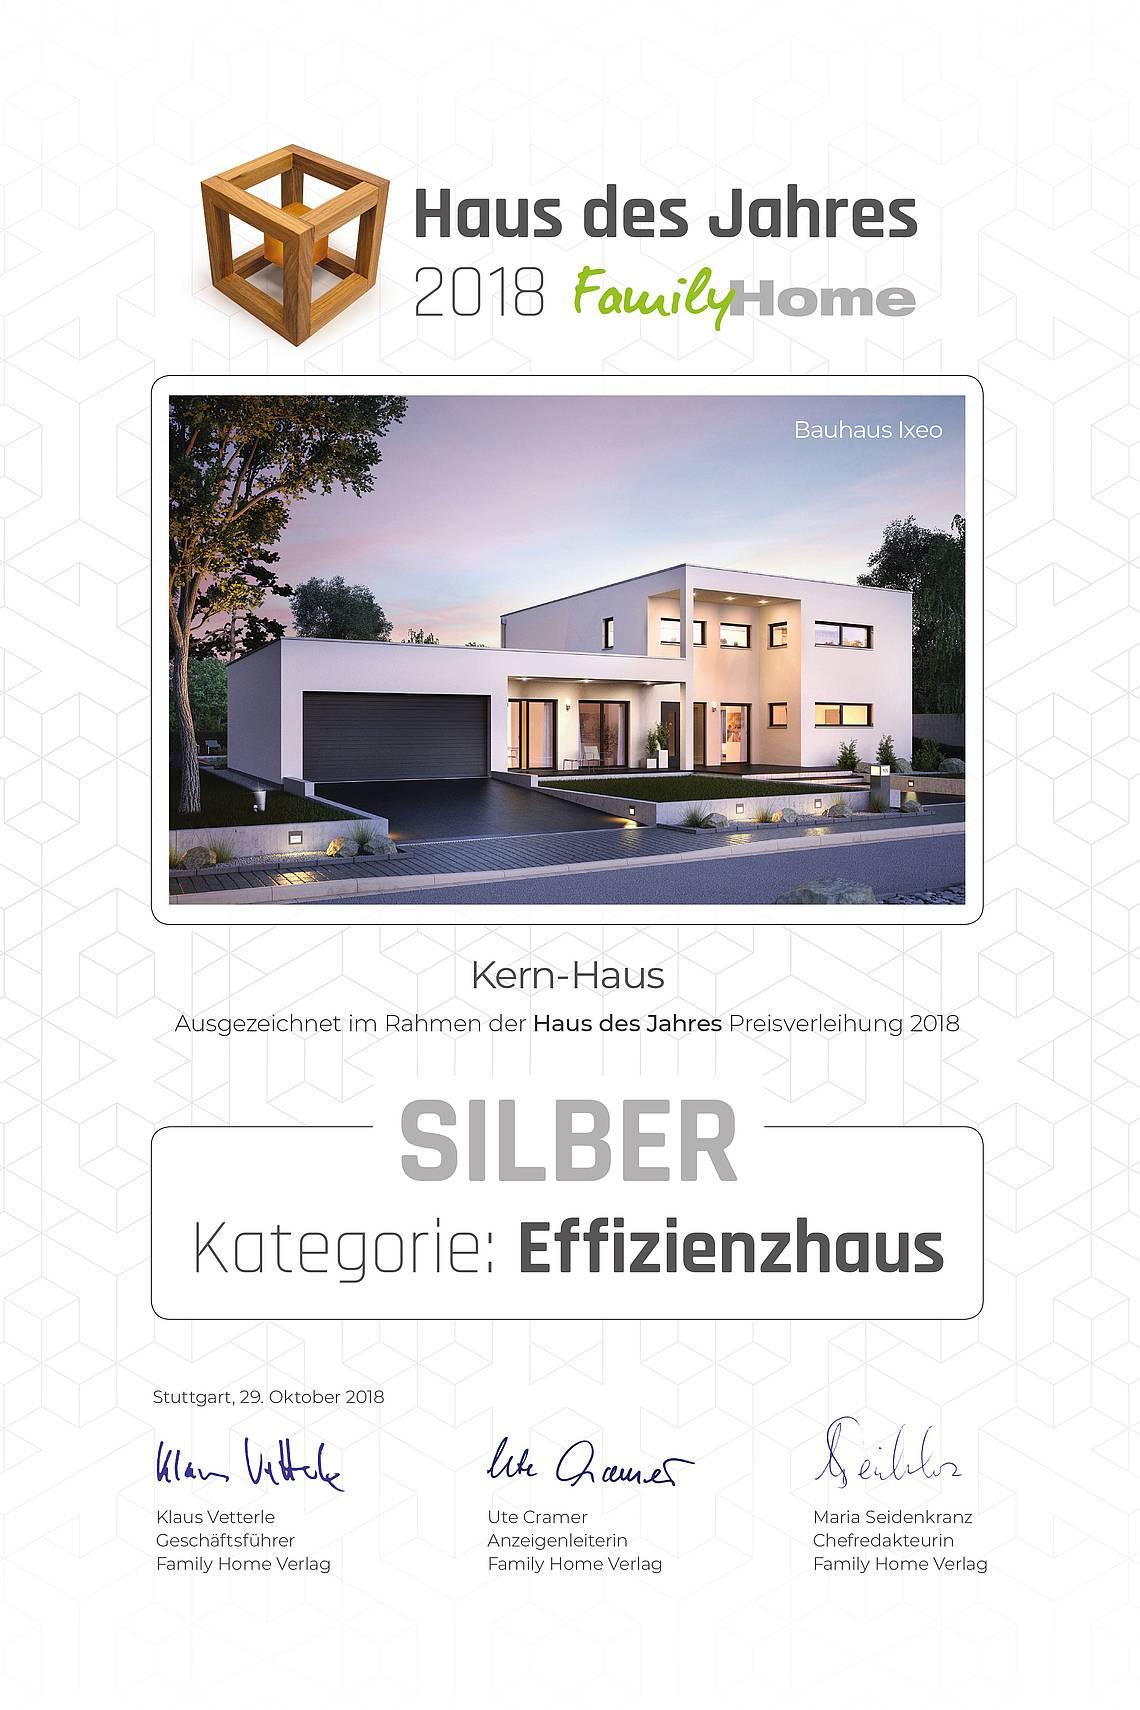 Urkunde Family Home Verlag: Haus des Jahres 2018